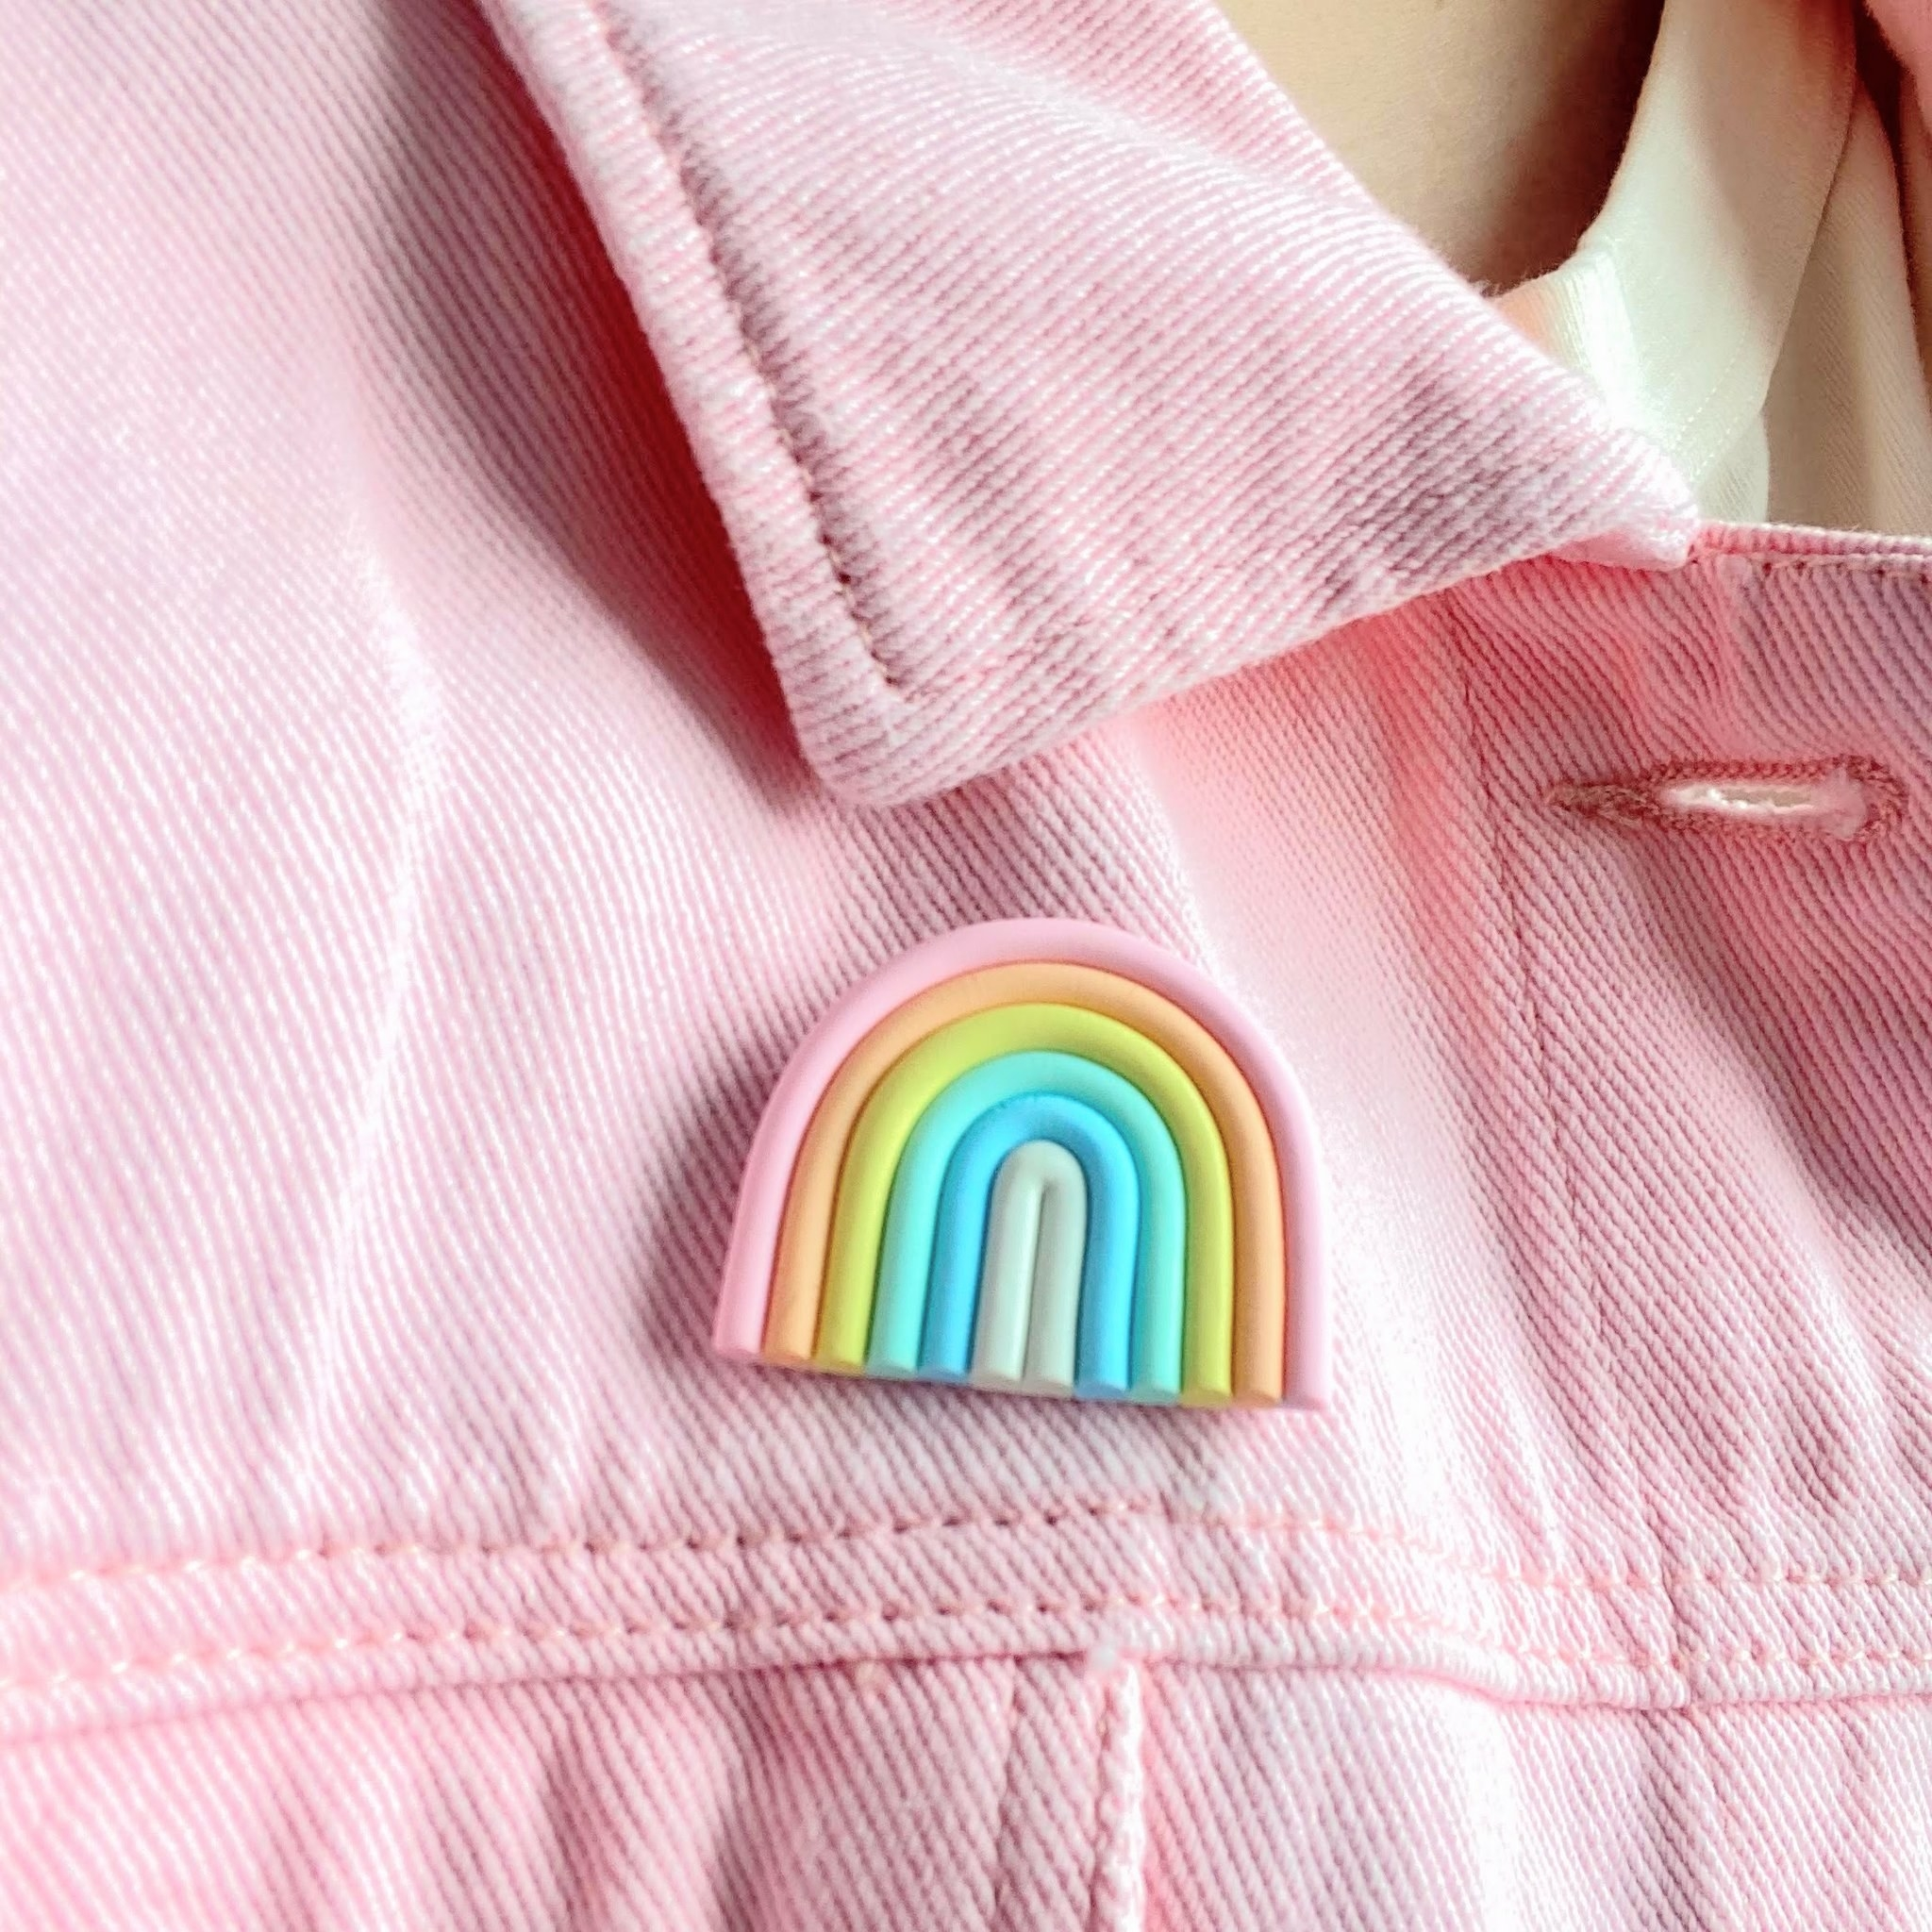 Rainbow-shaped clay pin on light pink denim jacket